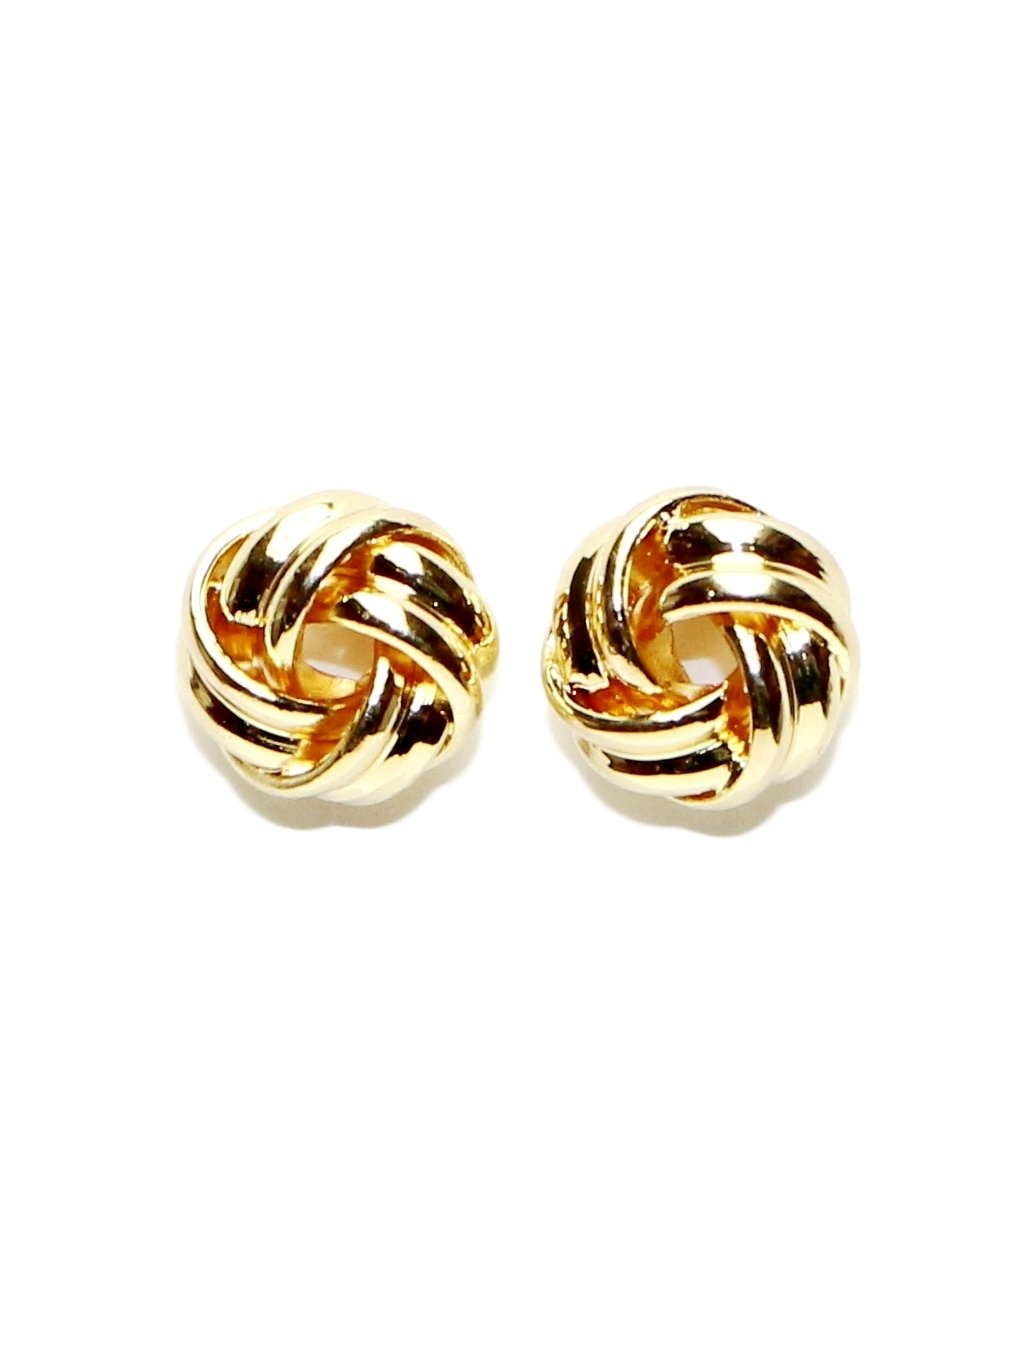 Surgical Stainless Steel Studs Earrings 11 MM Love-knot Men Women Ball Hypoallergenic Earrings